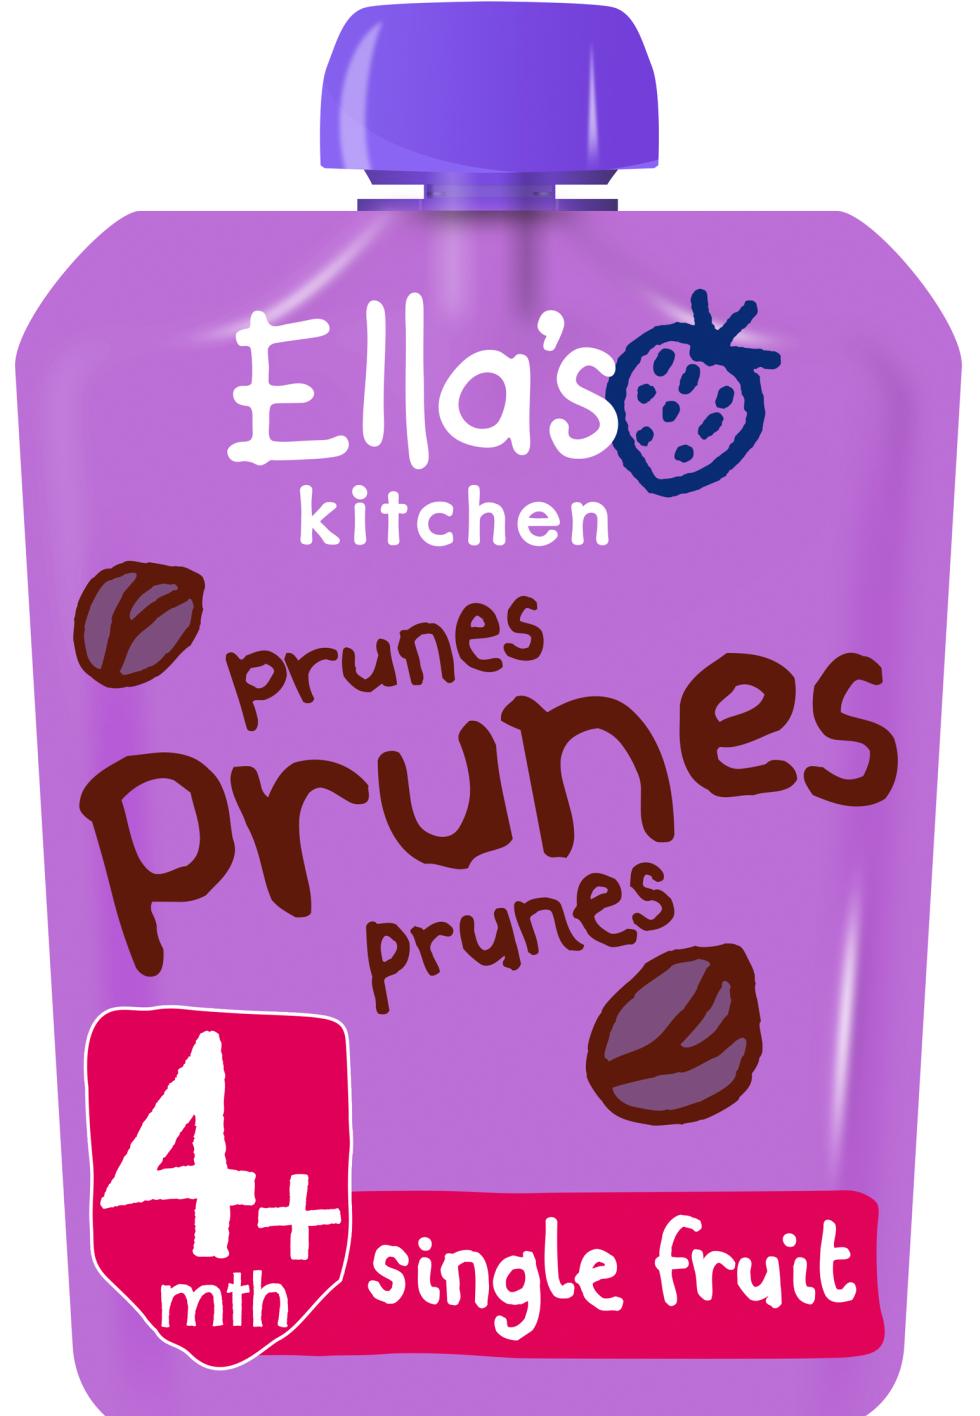 Ellas kitchen prunes prunes prunes pouch front of pack O